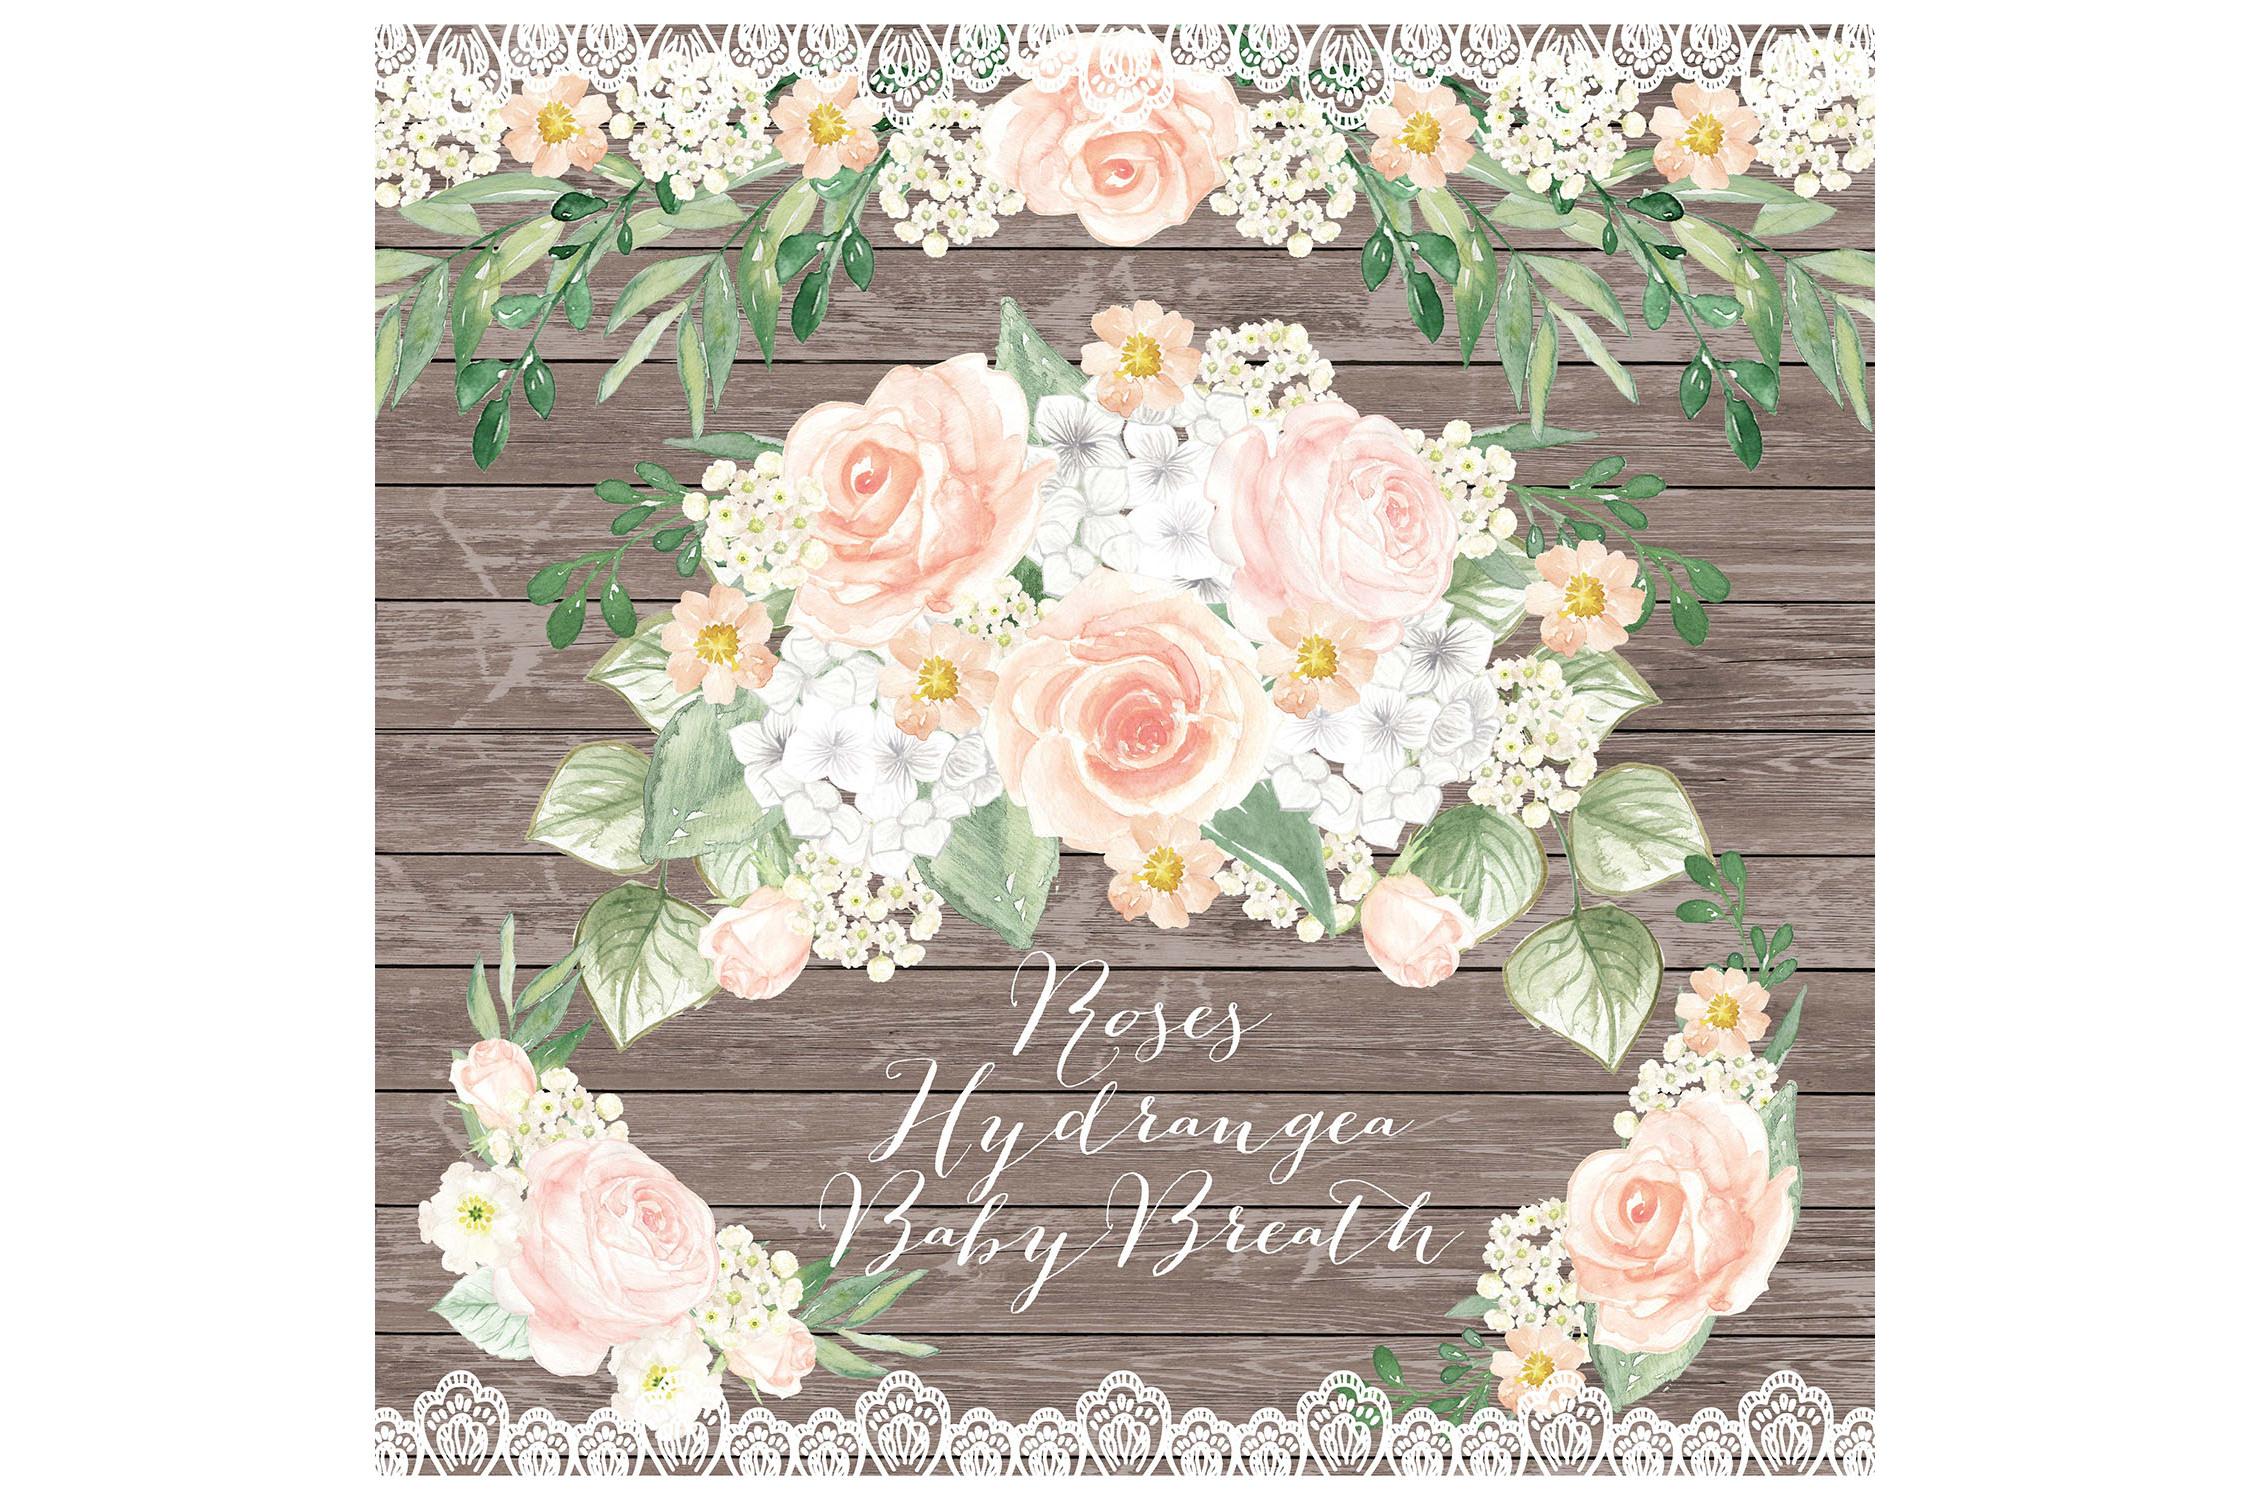 Watercolor Rustic Rose Peach Wreath Clip Art Example Image 1